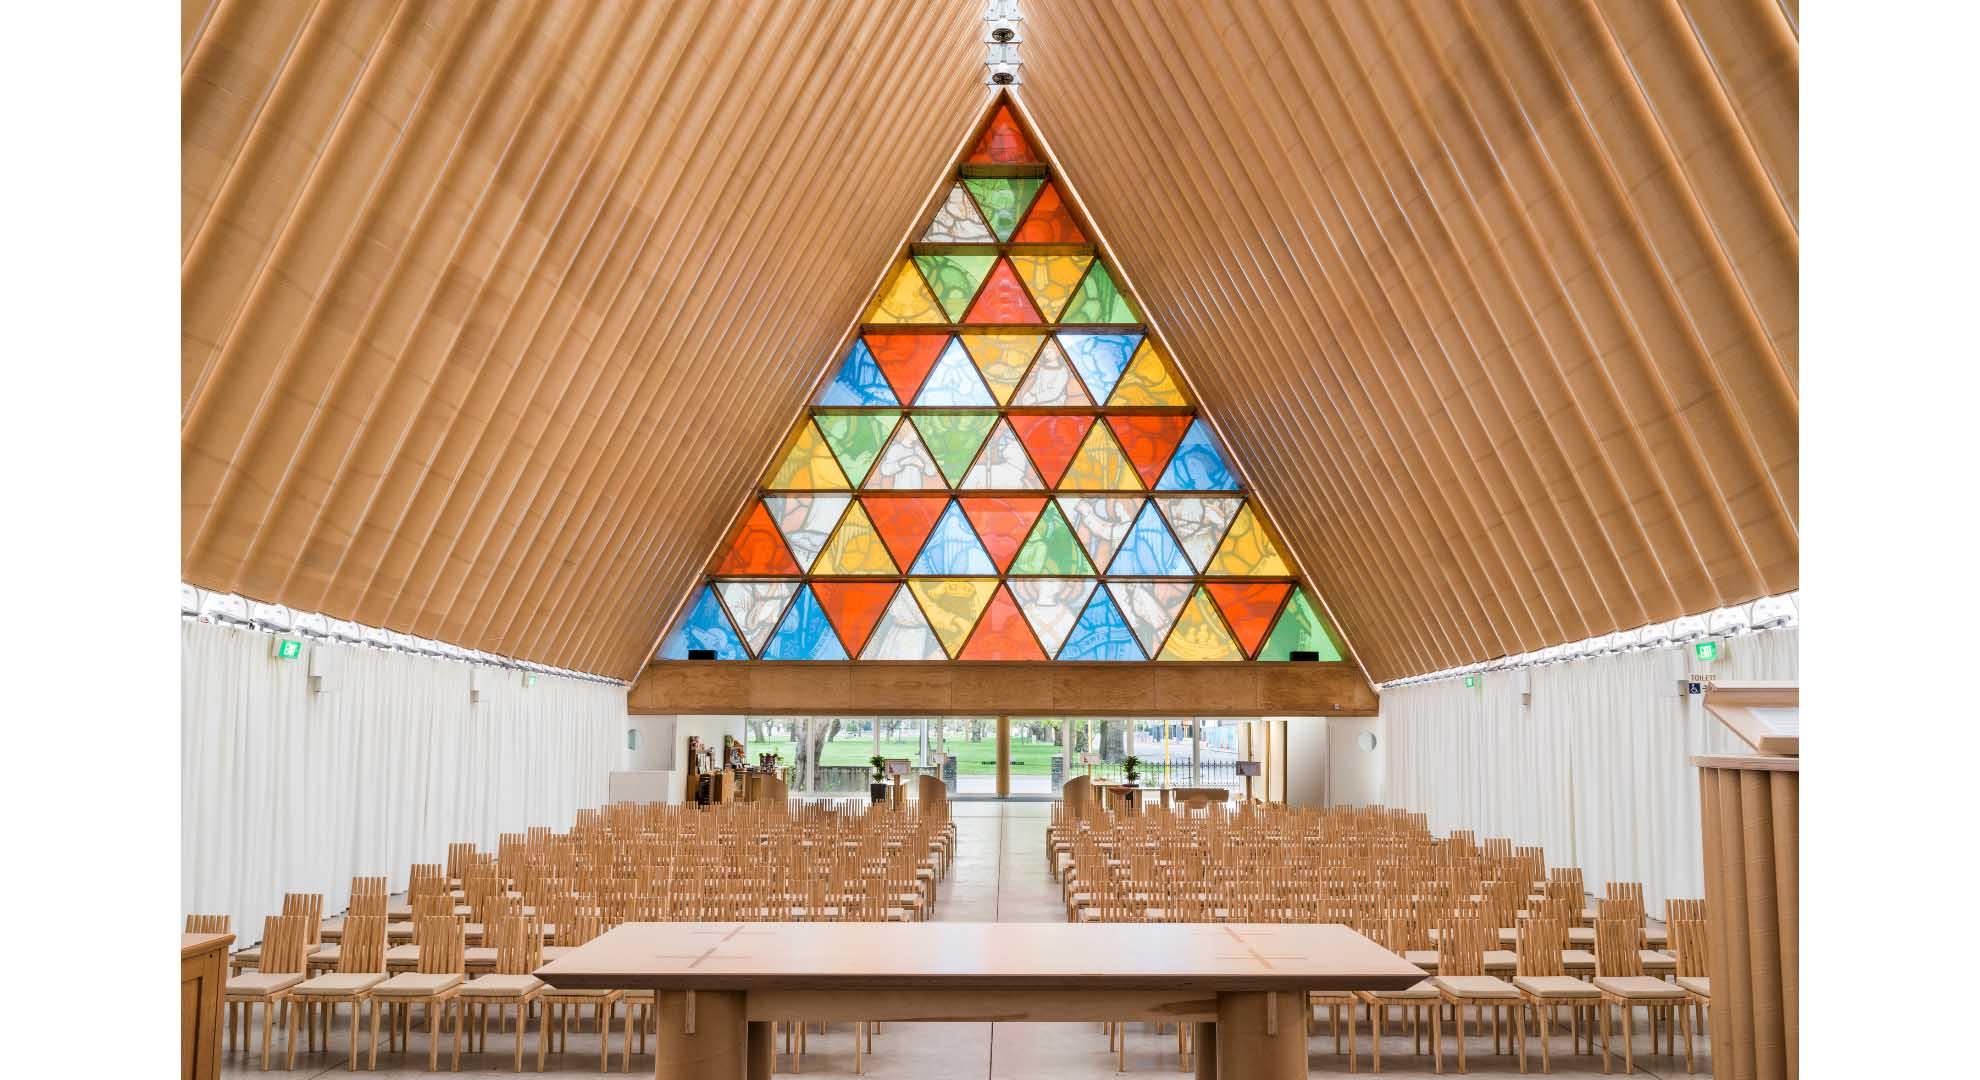 Cardboard Cathedral designed by Shigeru Ban.